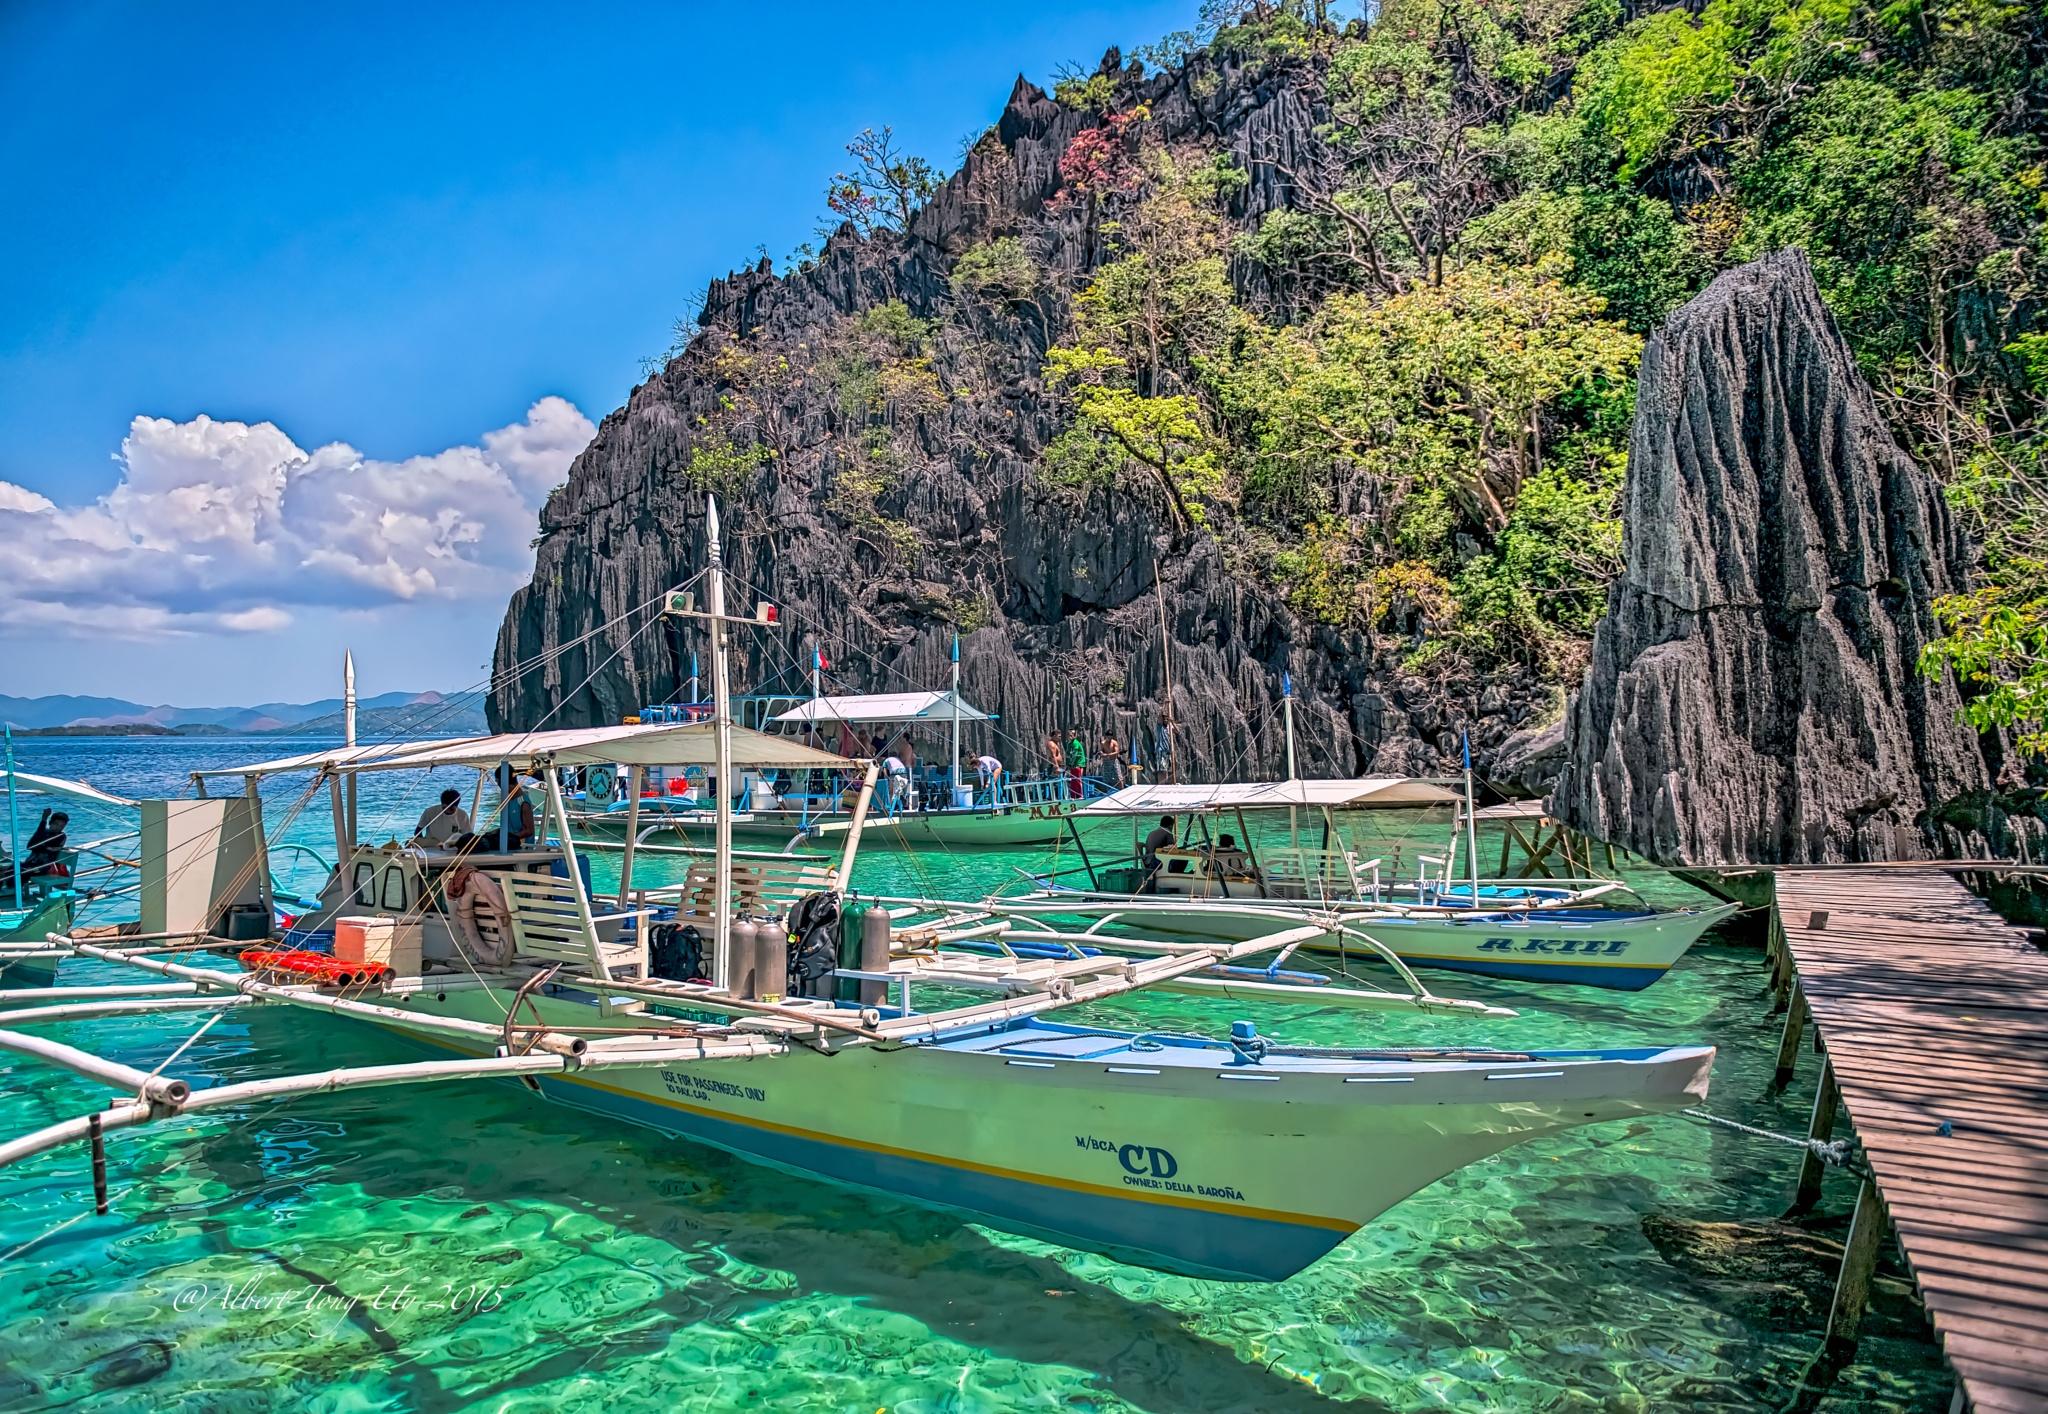 Coron, Palawan, Philippines...Island Hopping .....photo 81 by iatu8888